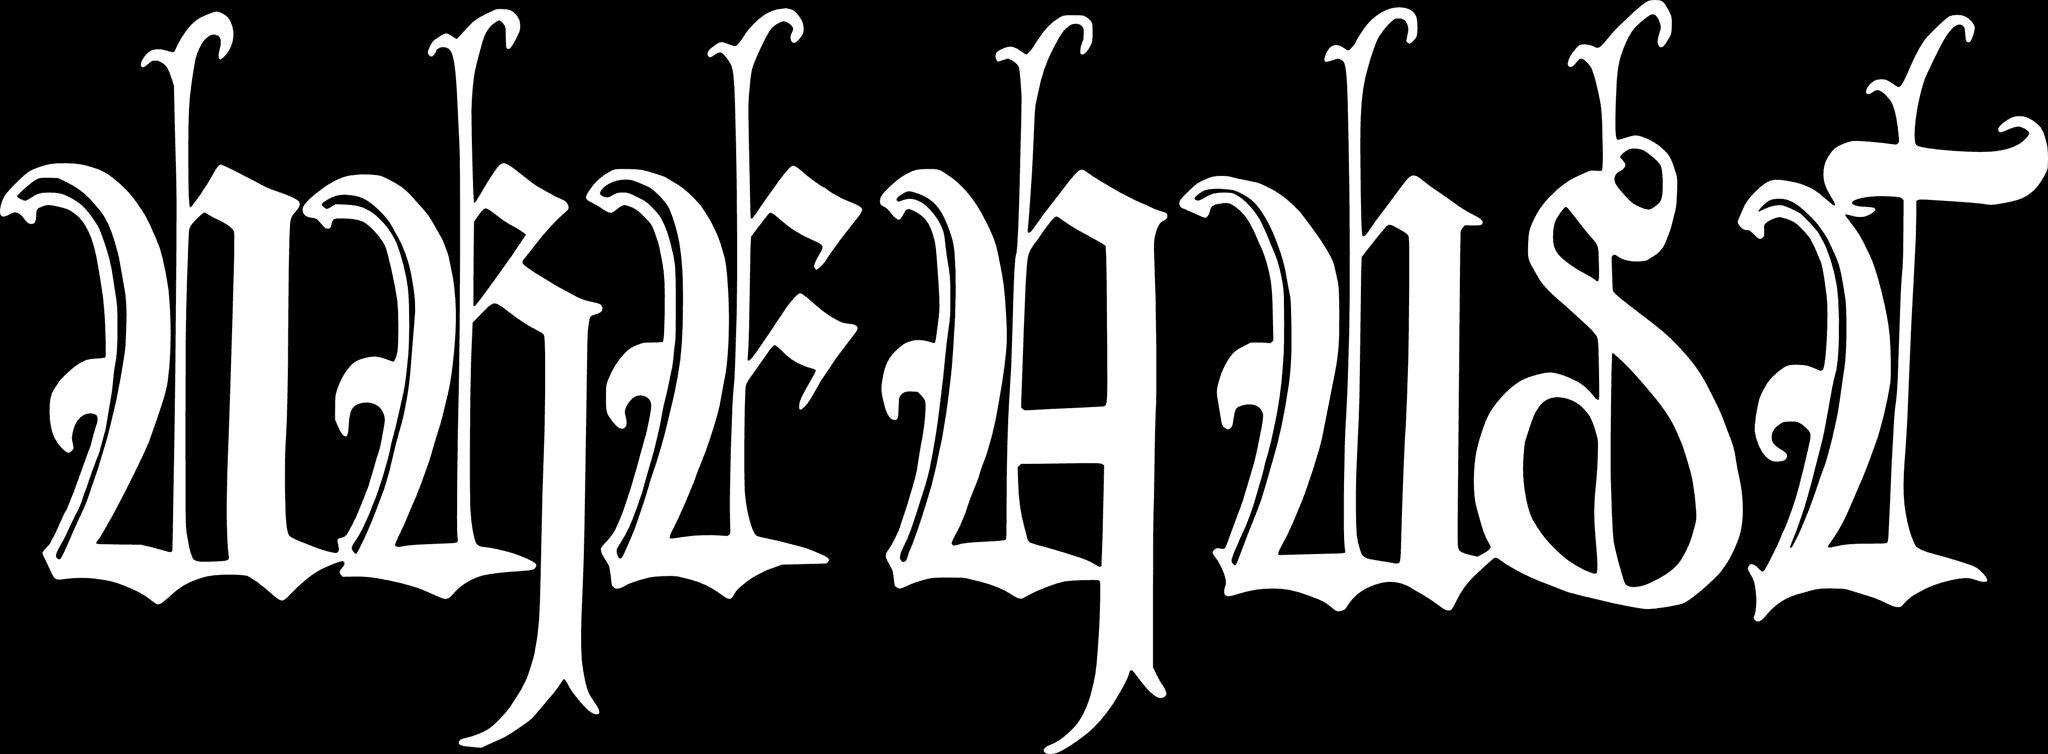 Urfaust - Logo